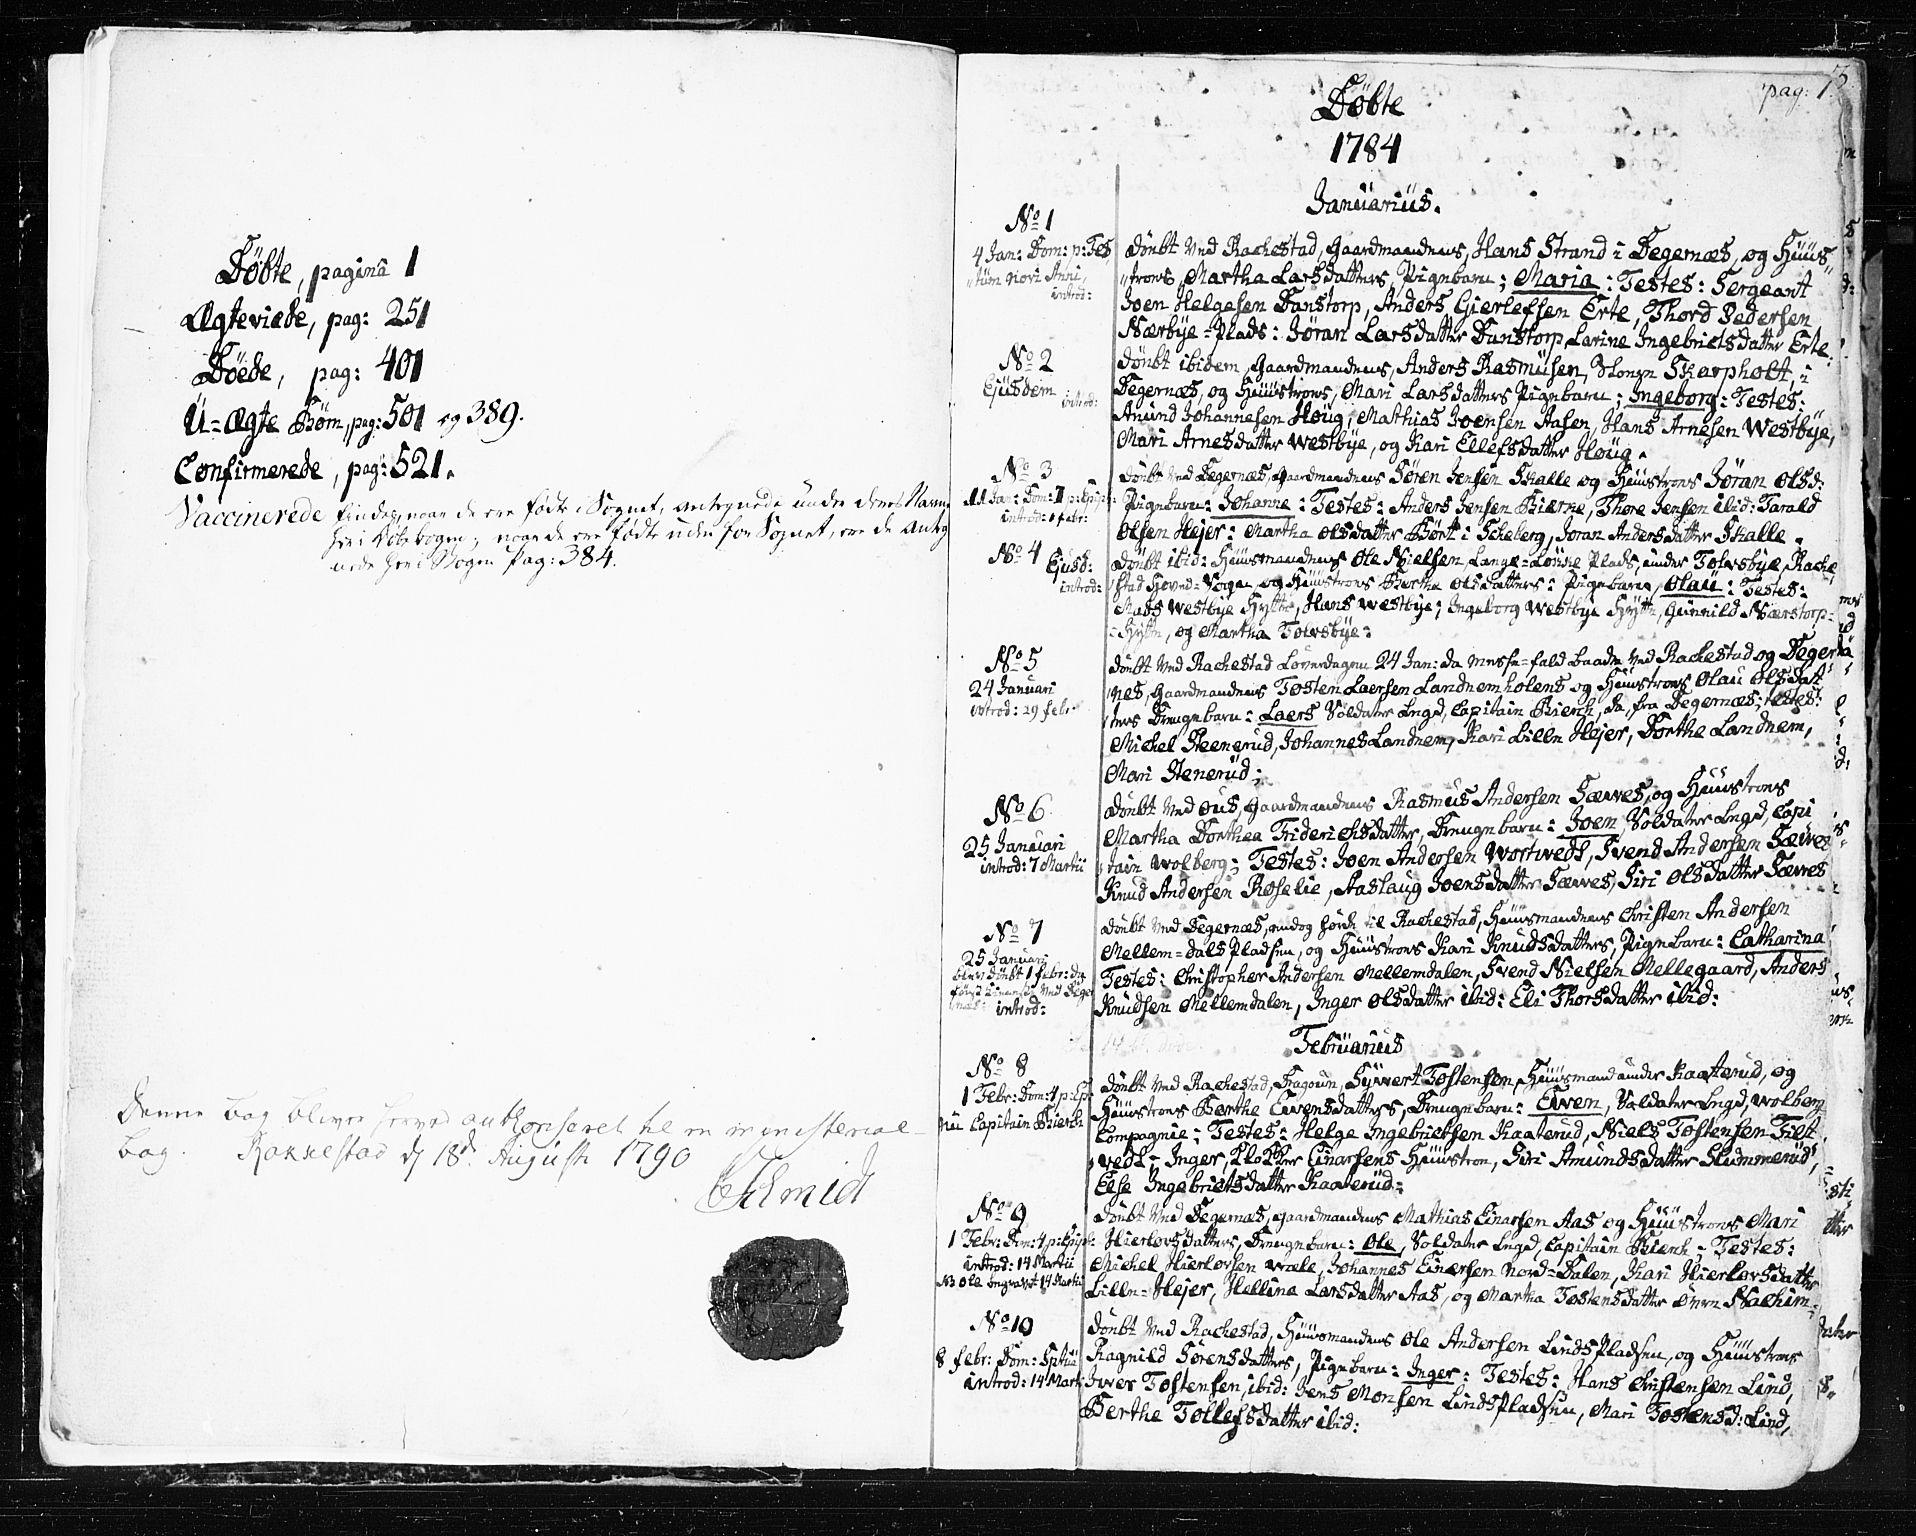 SAO, Rakkestad prestekontor Kirkebøker, F/Fa/L0005: Ministerialbok nr. I 5, 1784-1814, s. 0-1